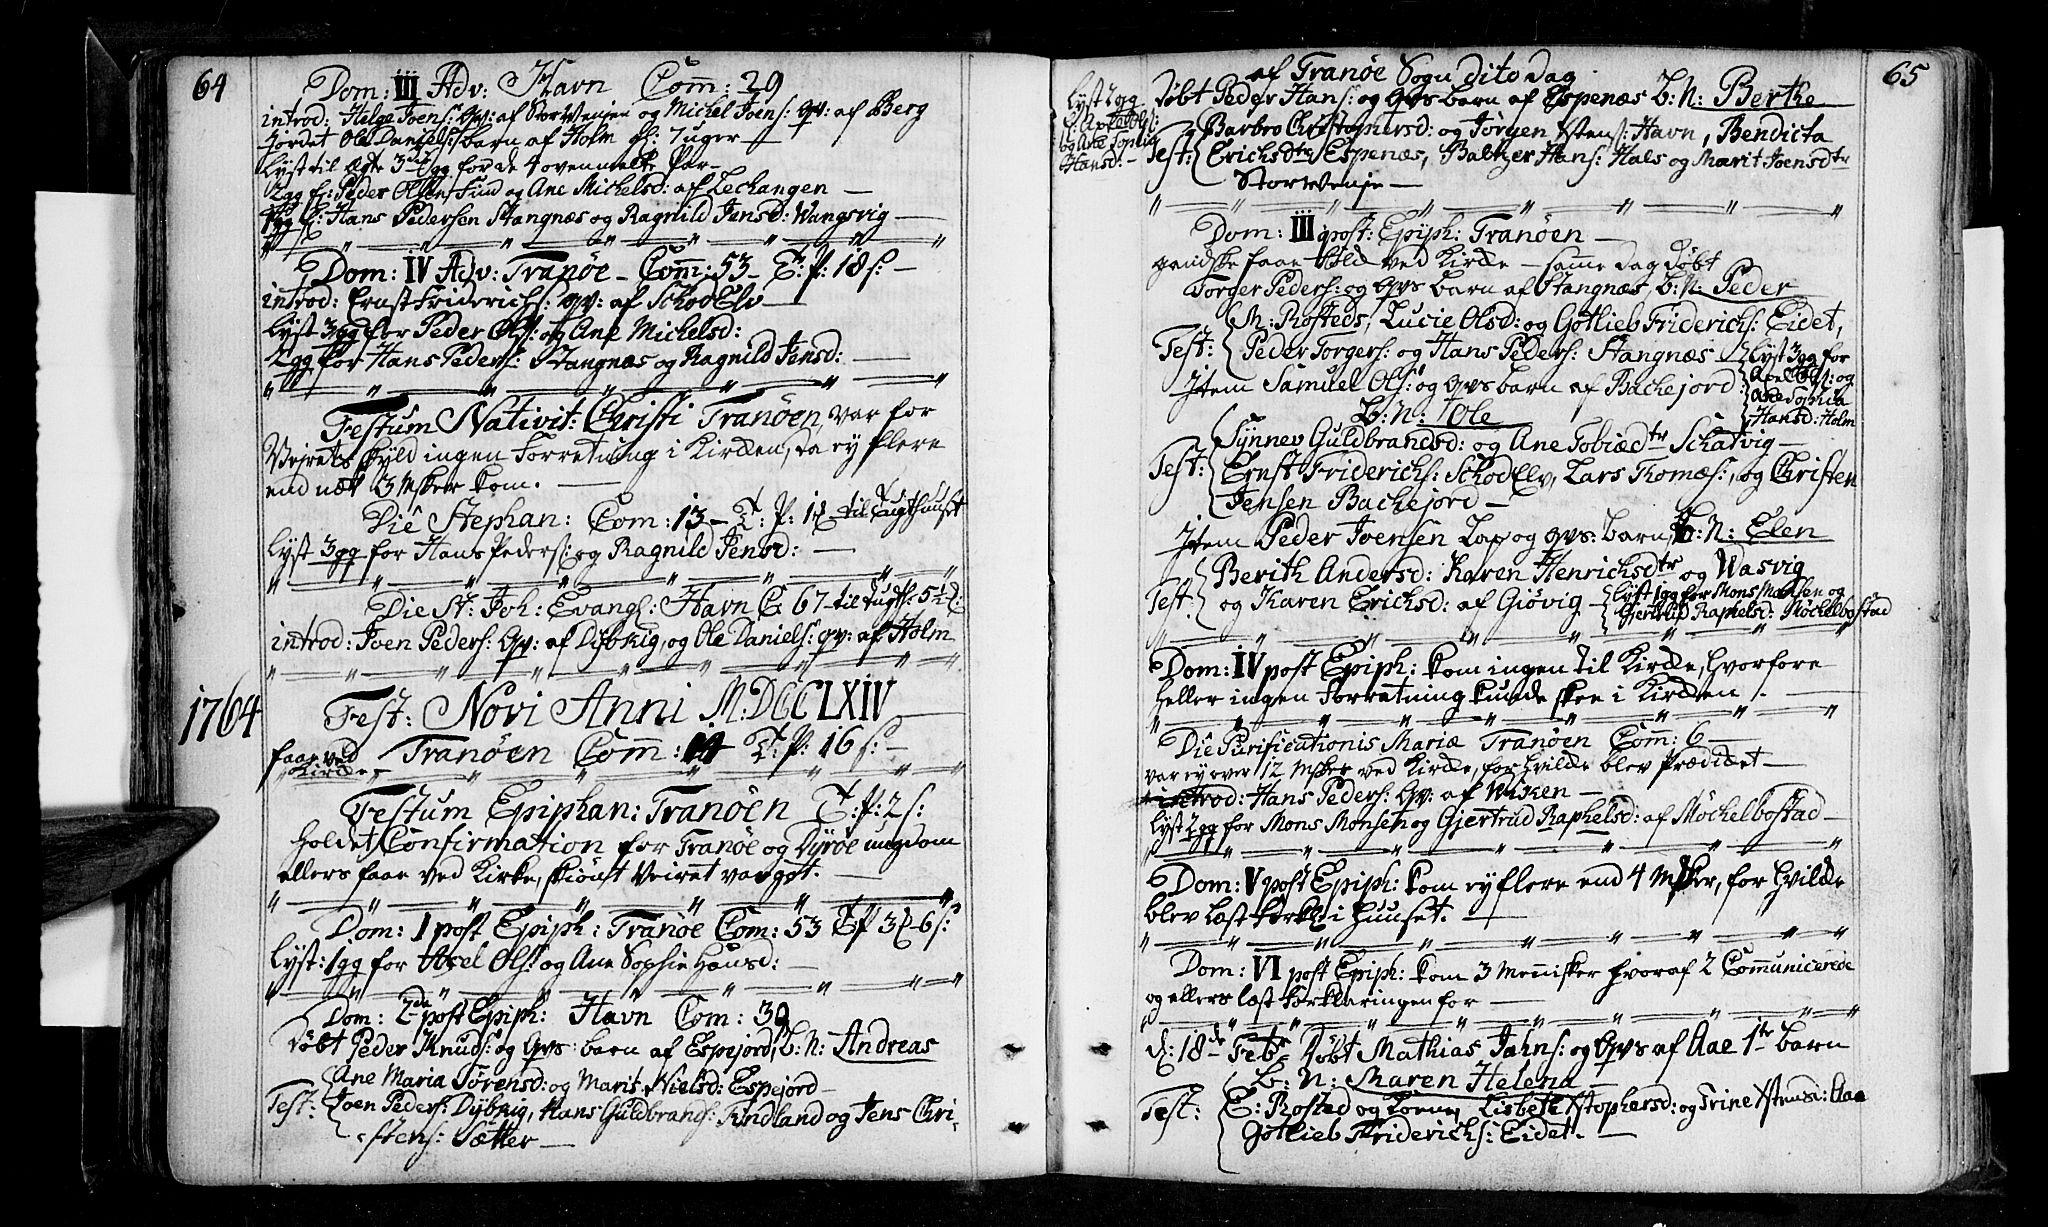 SATØ, Tranøy sokneprestkontor, I/Ia/Iaa/L0001kirke: Ministerialbok nr. 1, 1757-1773, s. 64-65